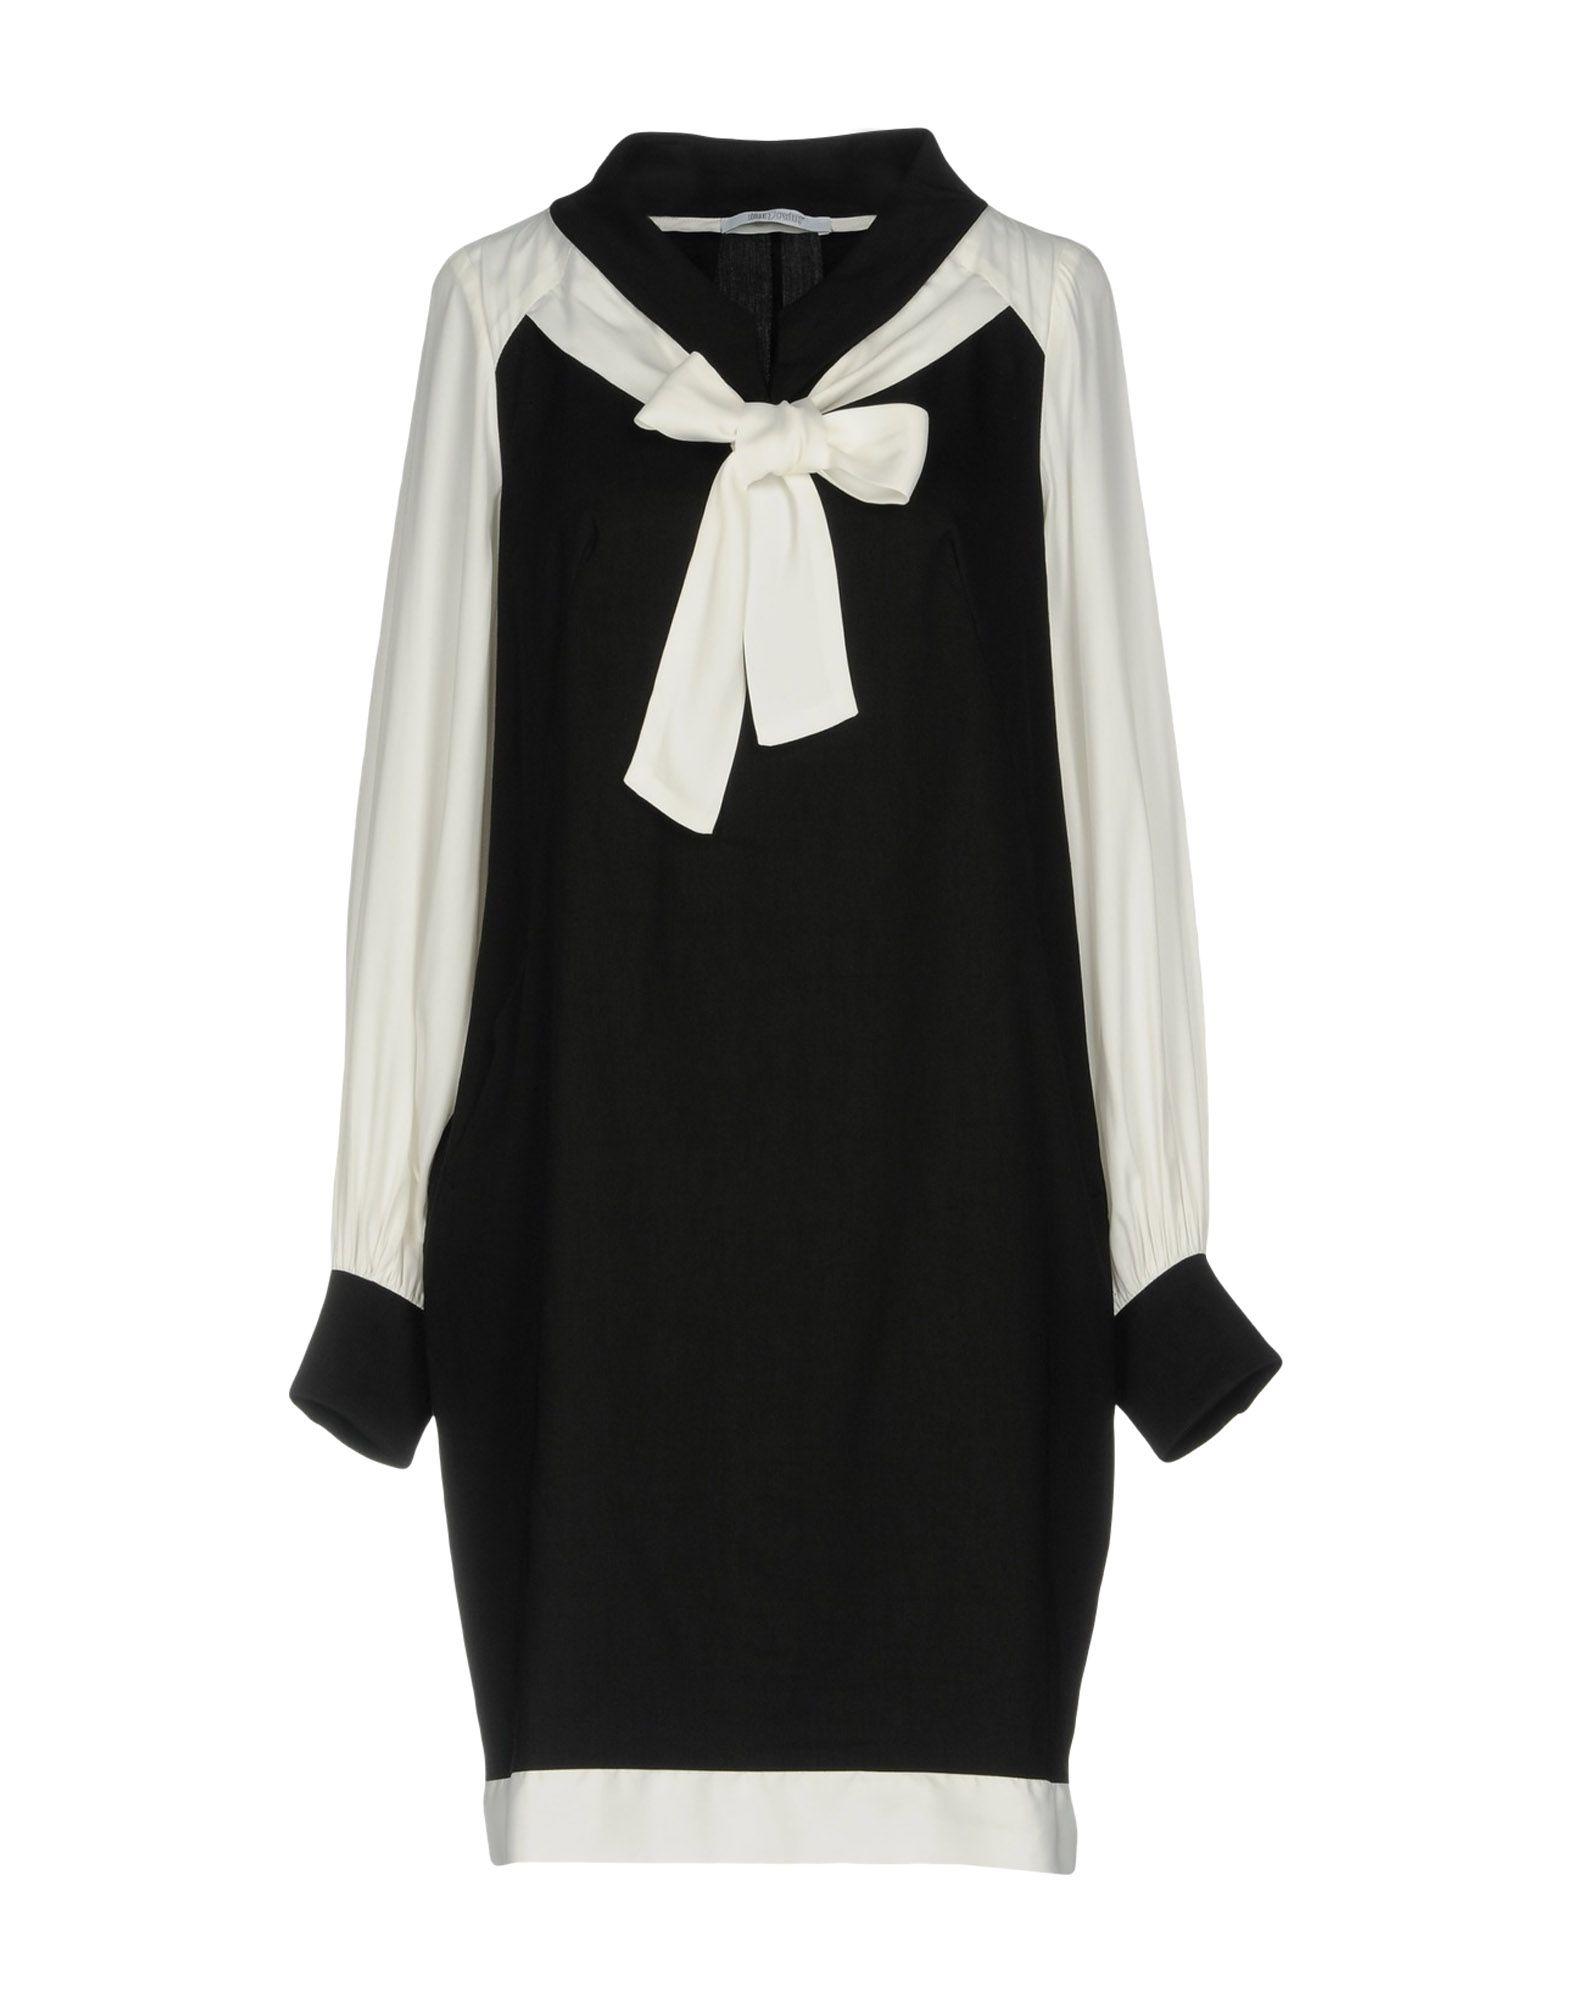 OBLIQUE CREATIONS Короткое платье клепки для одежды three creations 1000 10 nailheads 80374